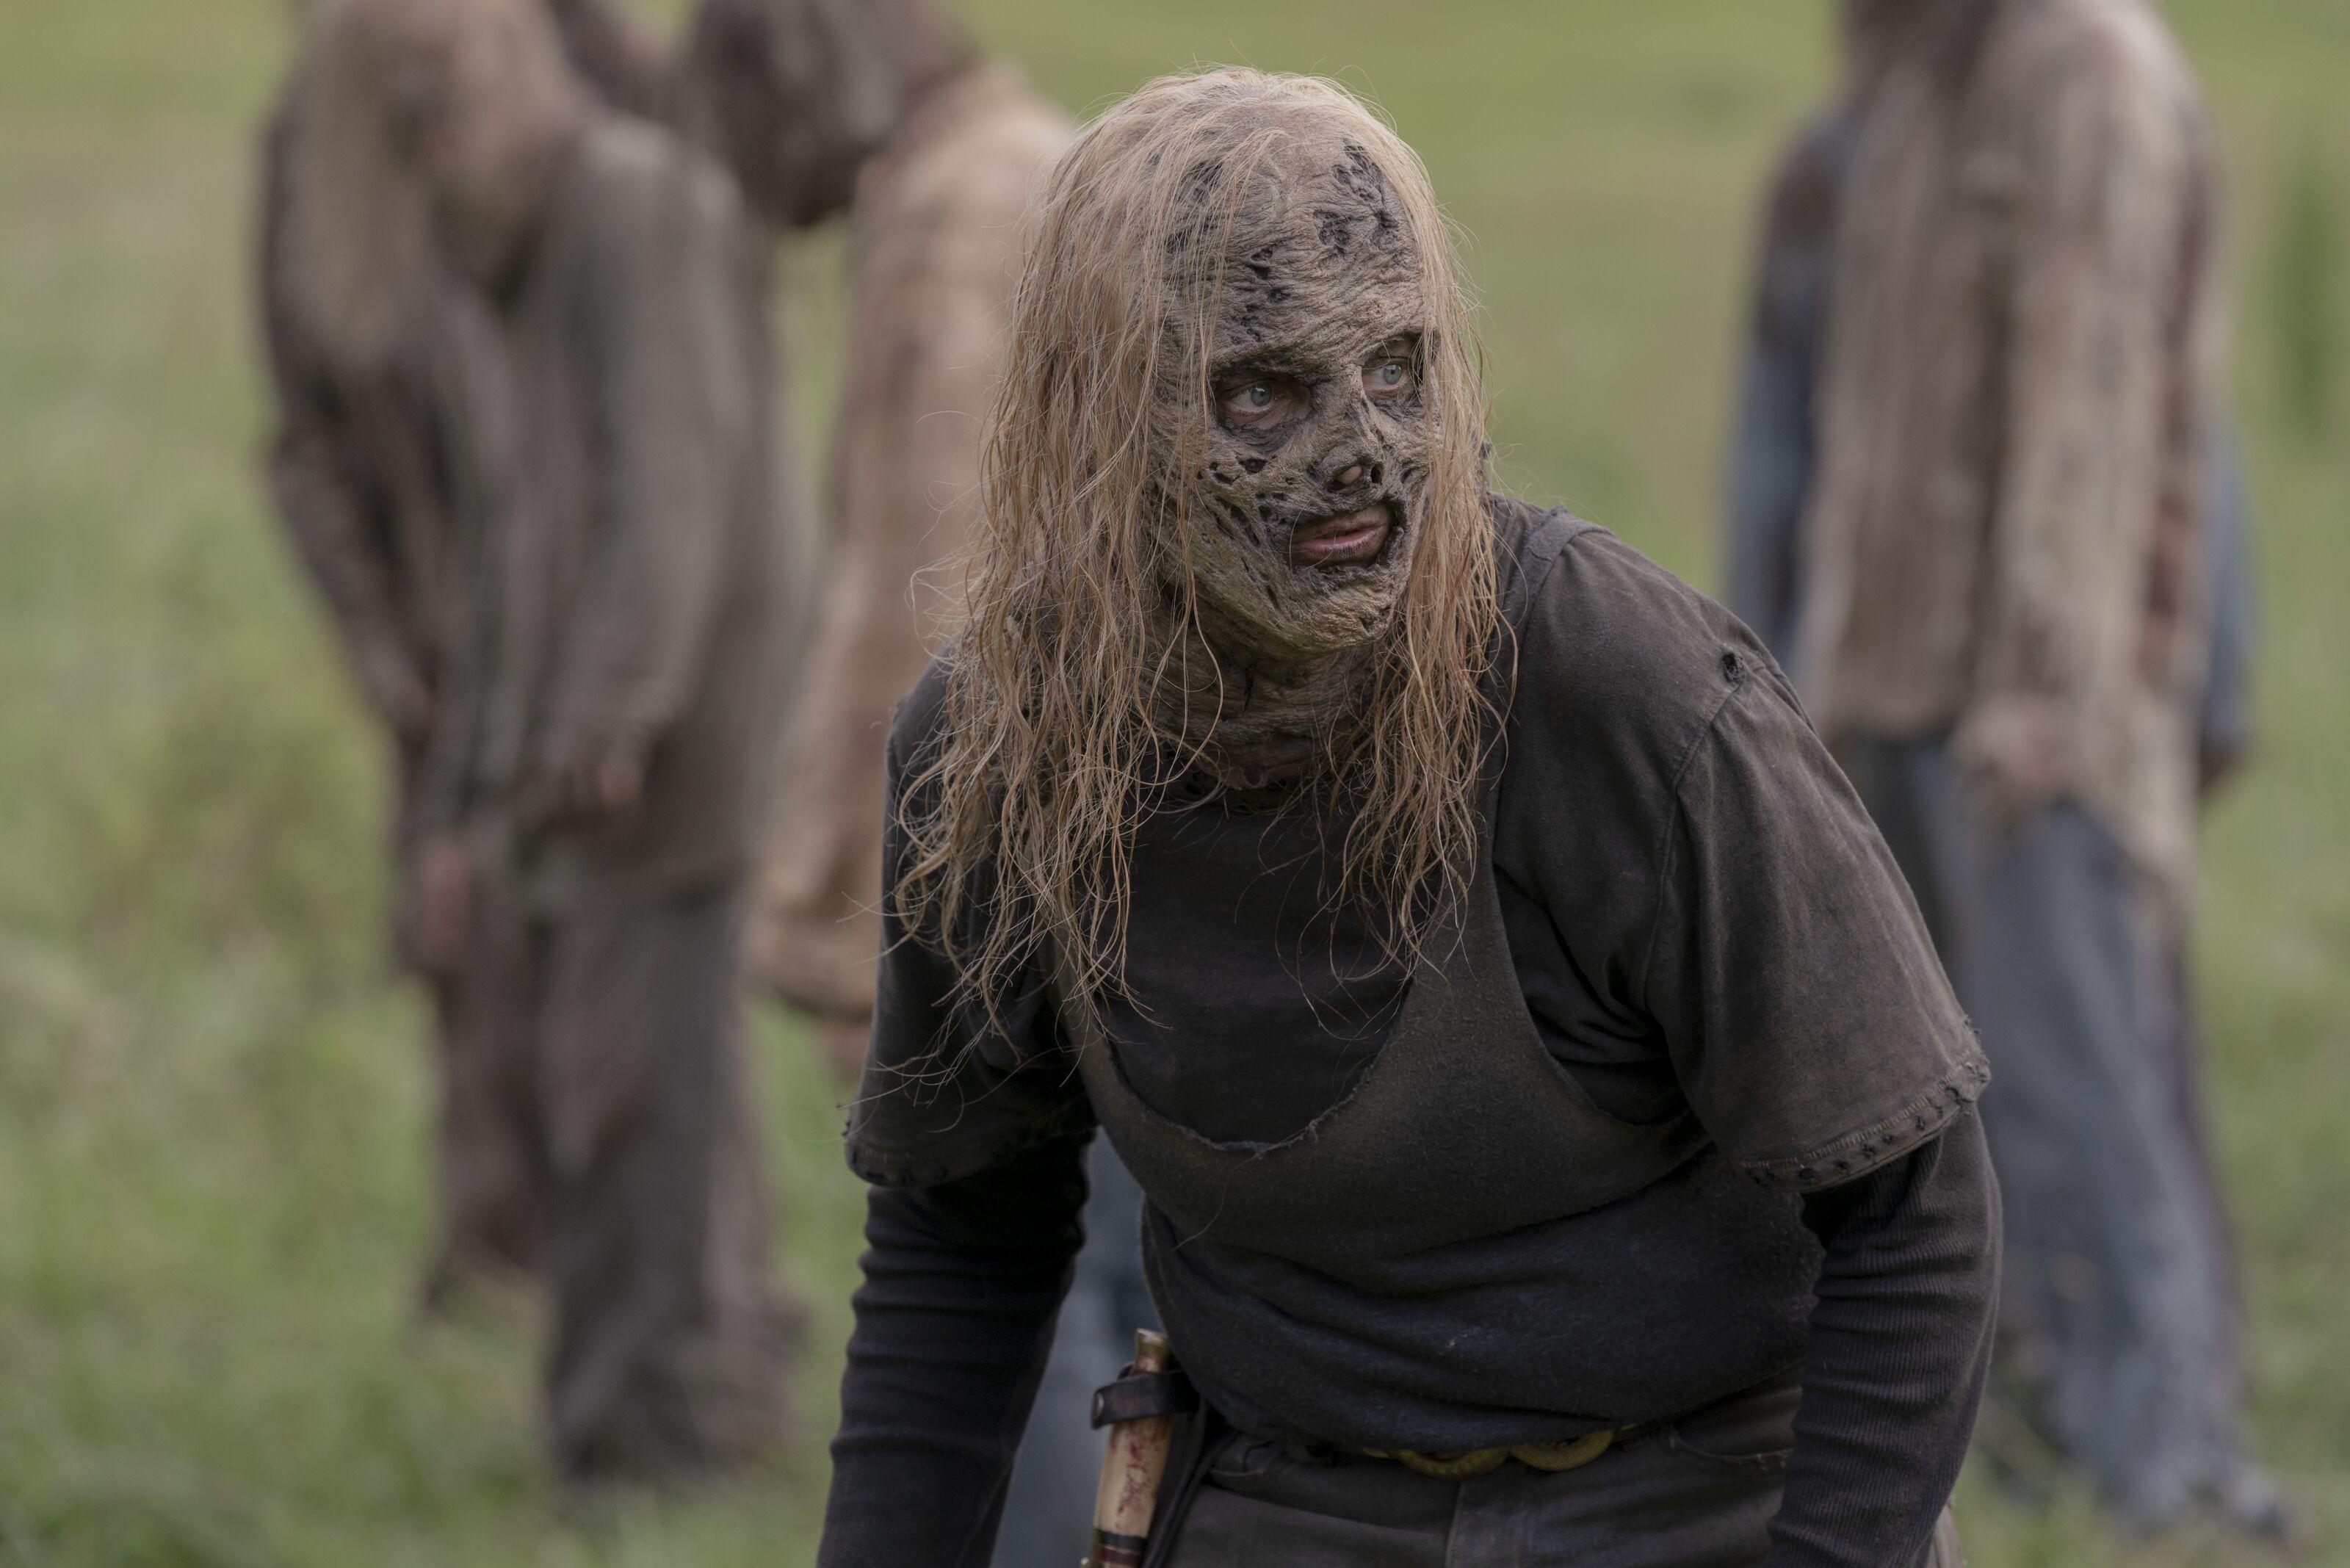 The Walking Dead season 10 episode 2 review: The dark origin of the Whisperers